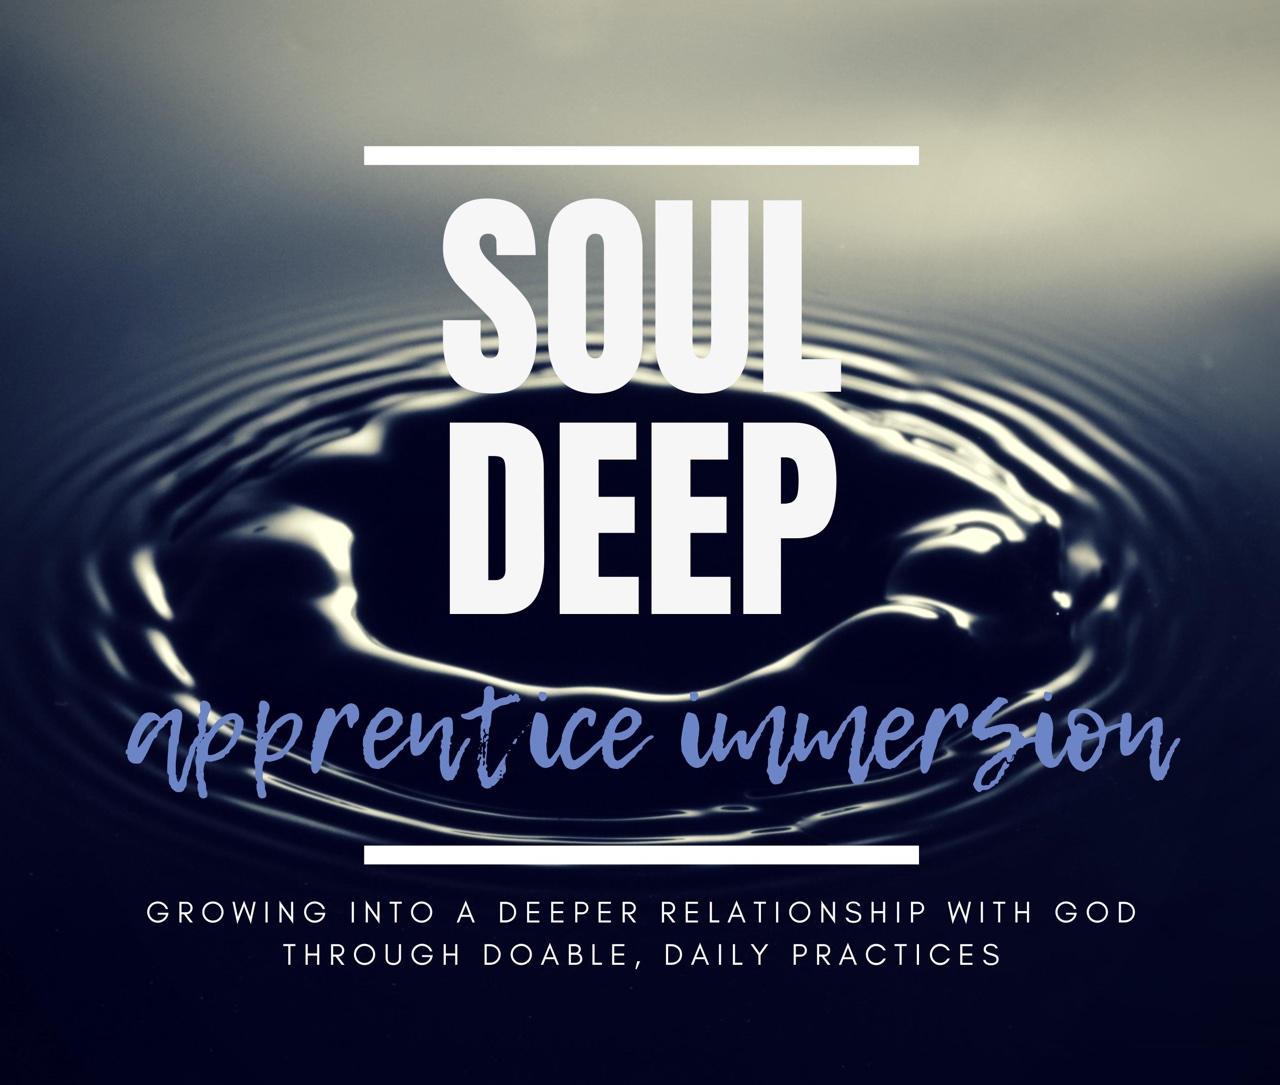 Soul Deep: apprentice immersion